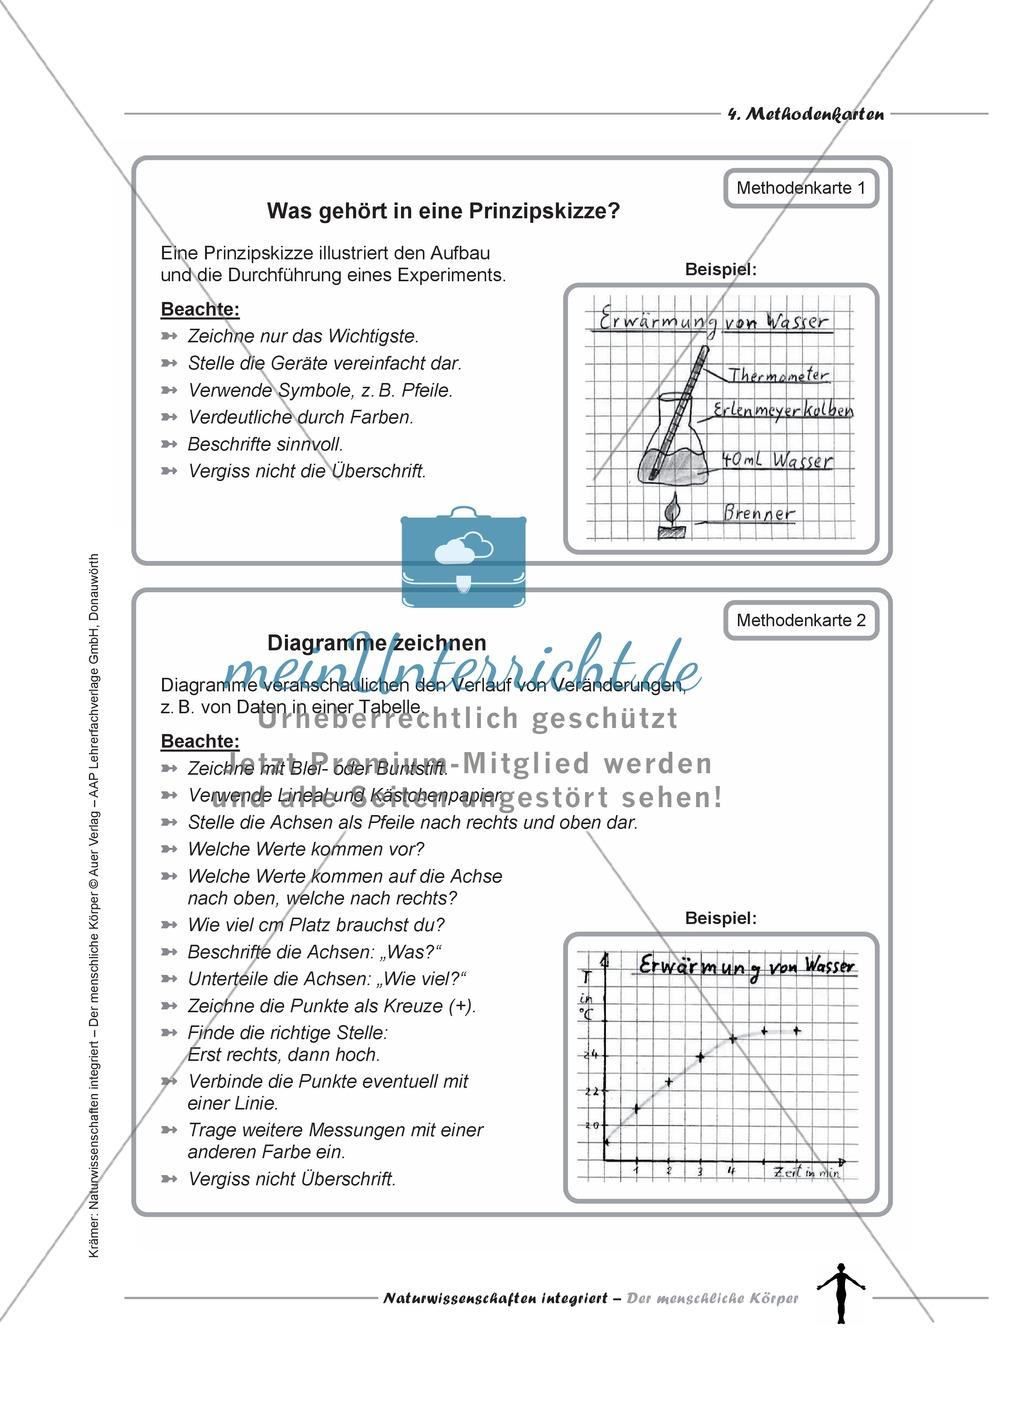 Methodenkarten: Prinzipskizze, Diagramme, Tabellen ...